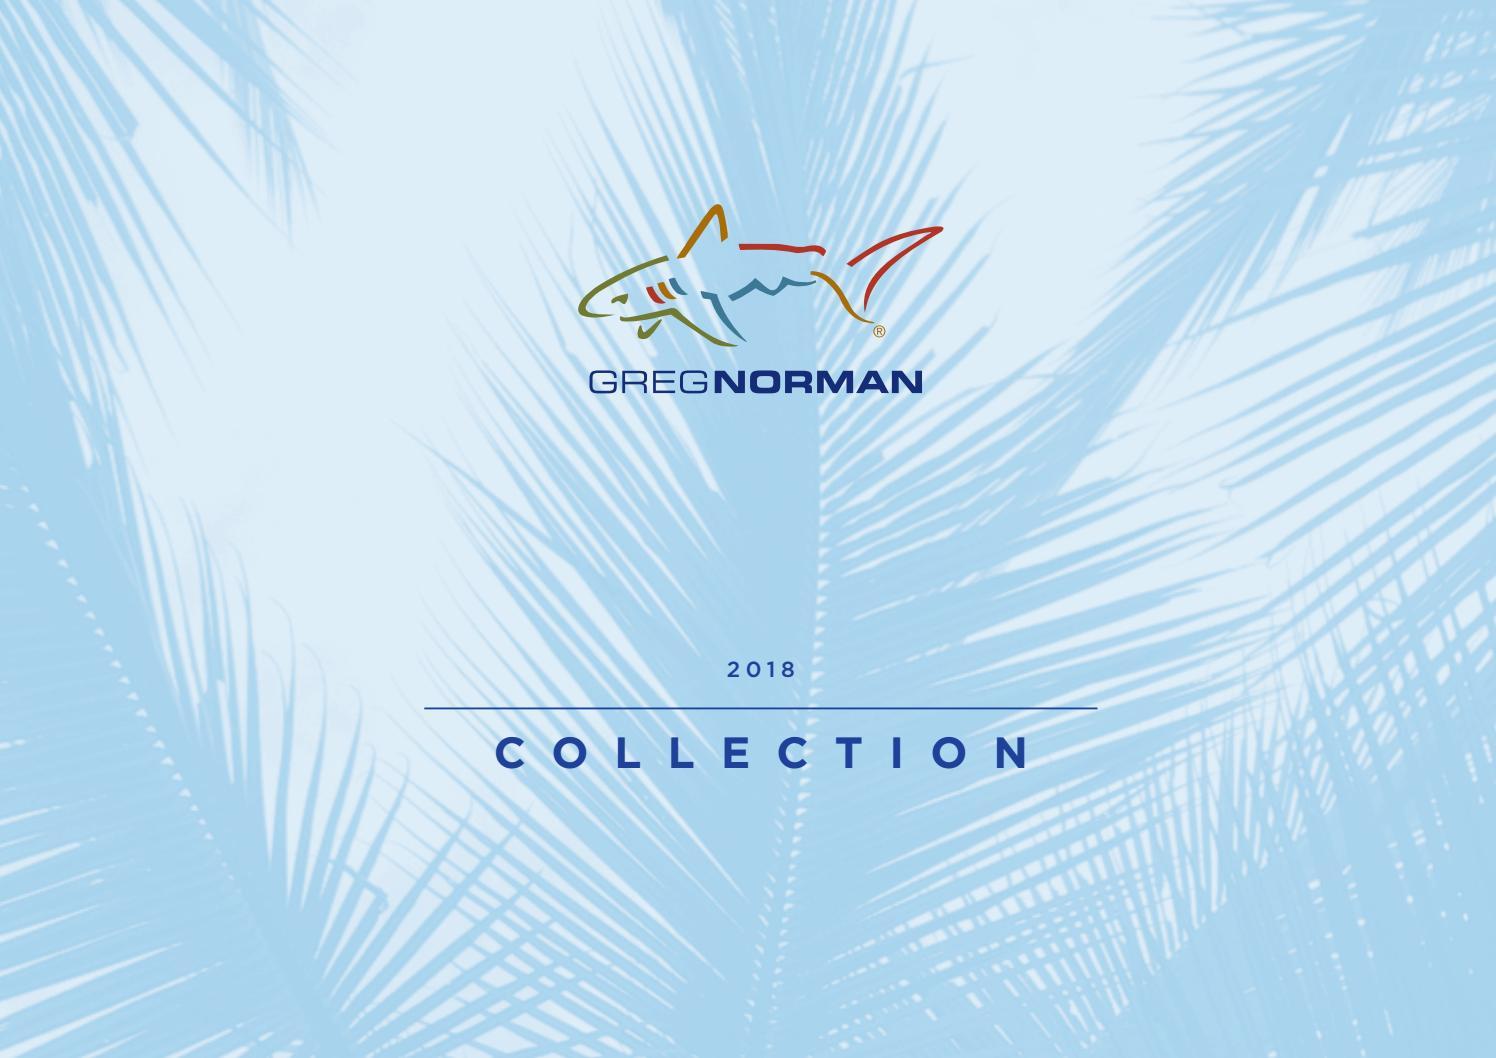 Greg Norman Collection UK - 2018 - Trade Catalogue by ProQuip Golf Ltd -  issuu d5a09d67bd9e